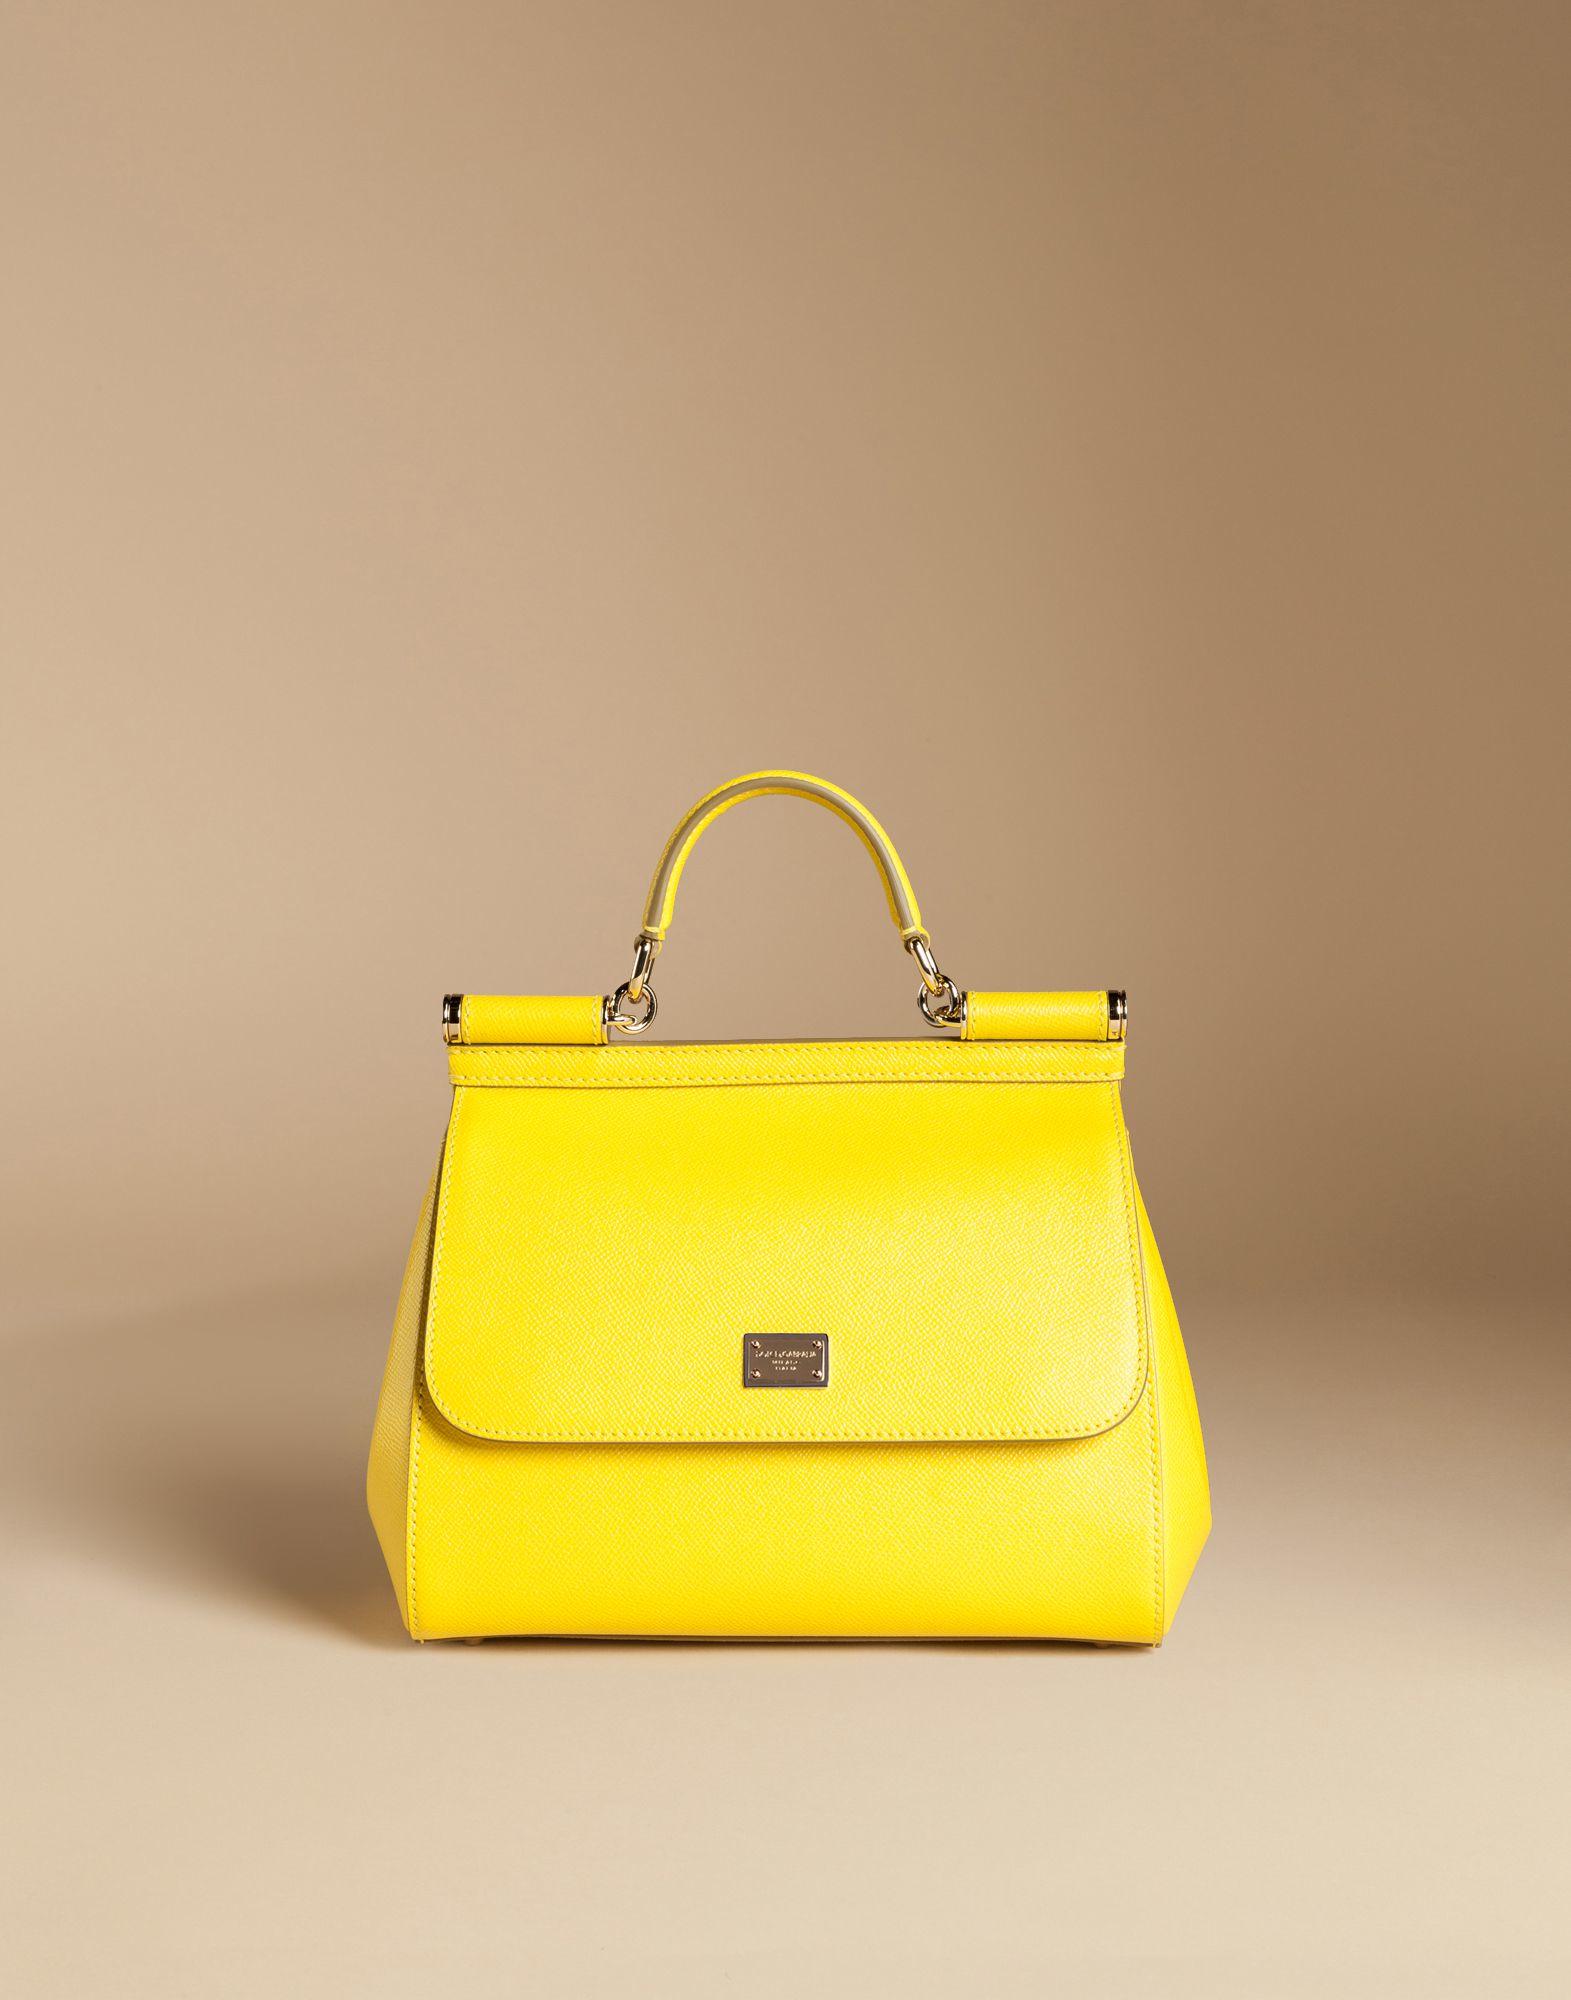 Gallery. Women s Leather Handbags Women s Yellow Handbags Women s Dolce  Gabbana Sicily Women s Camera ... b53279d4e4dbc